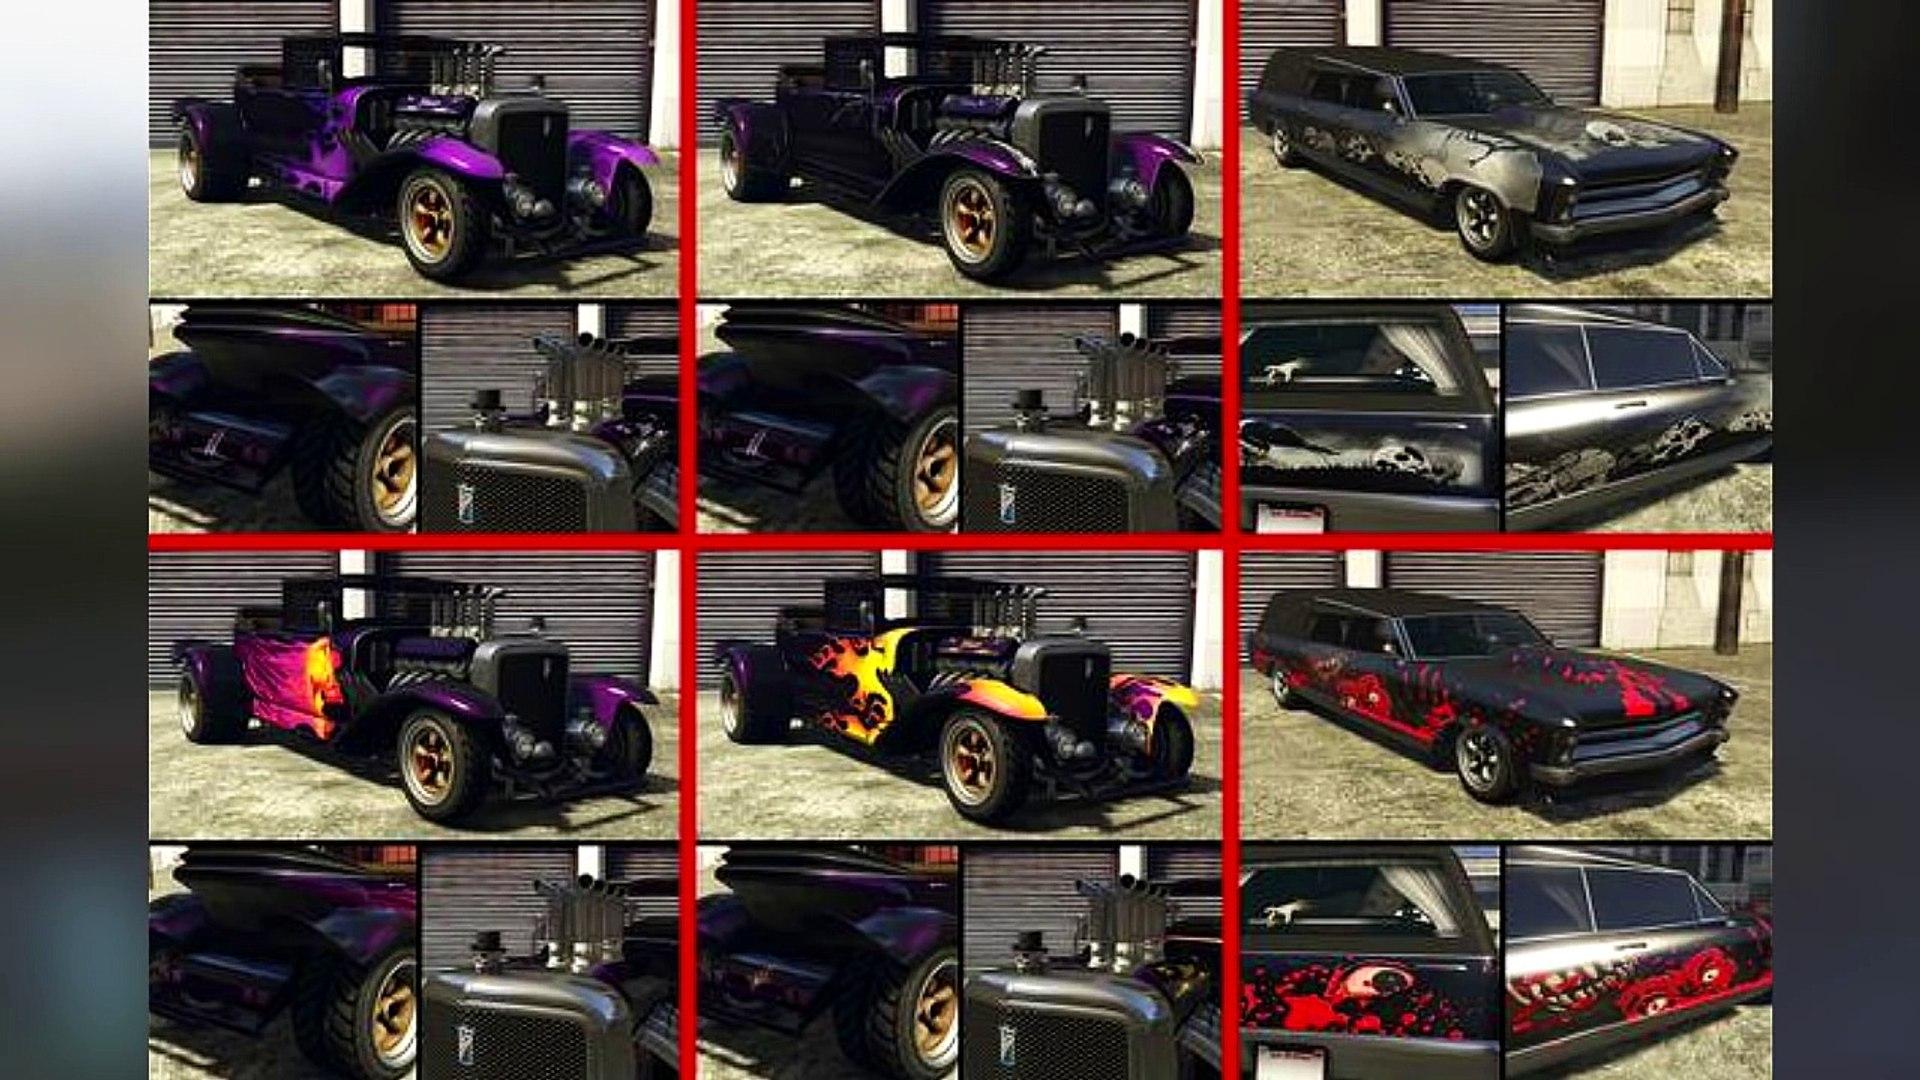 Gta 5 Halloween Cars 2020 GTA 5 HALLOWEEN DLC Update GTA 5 DLC Cars Prices, City Blackout